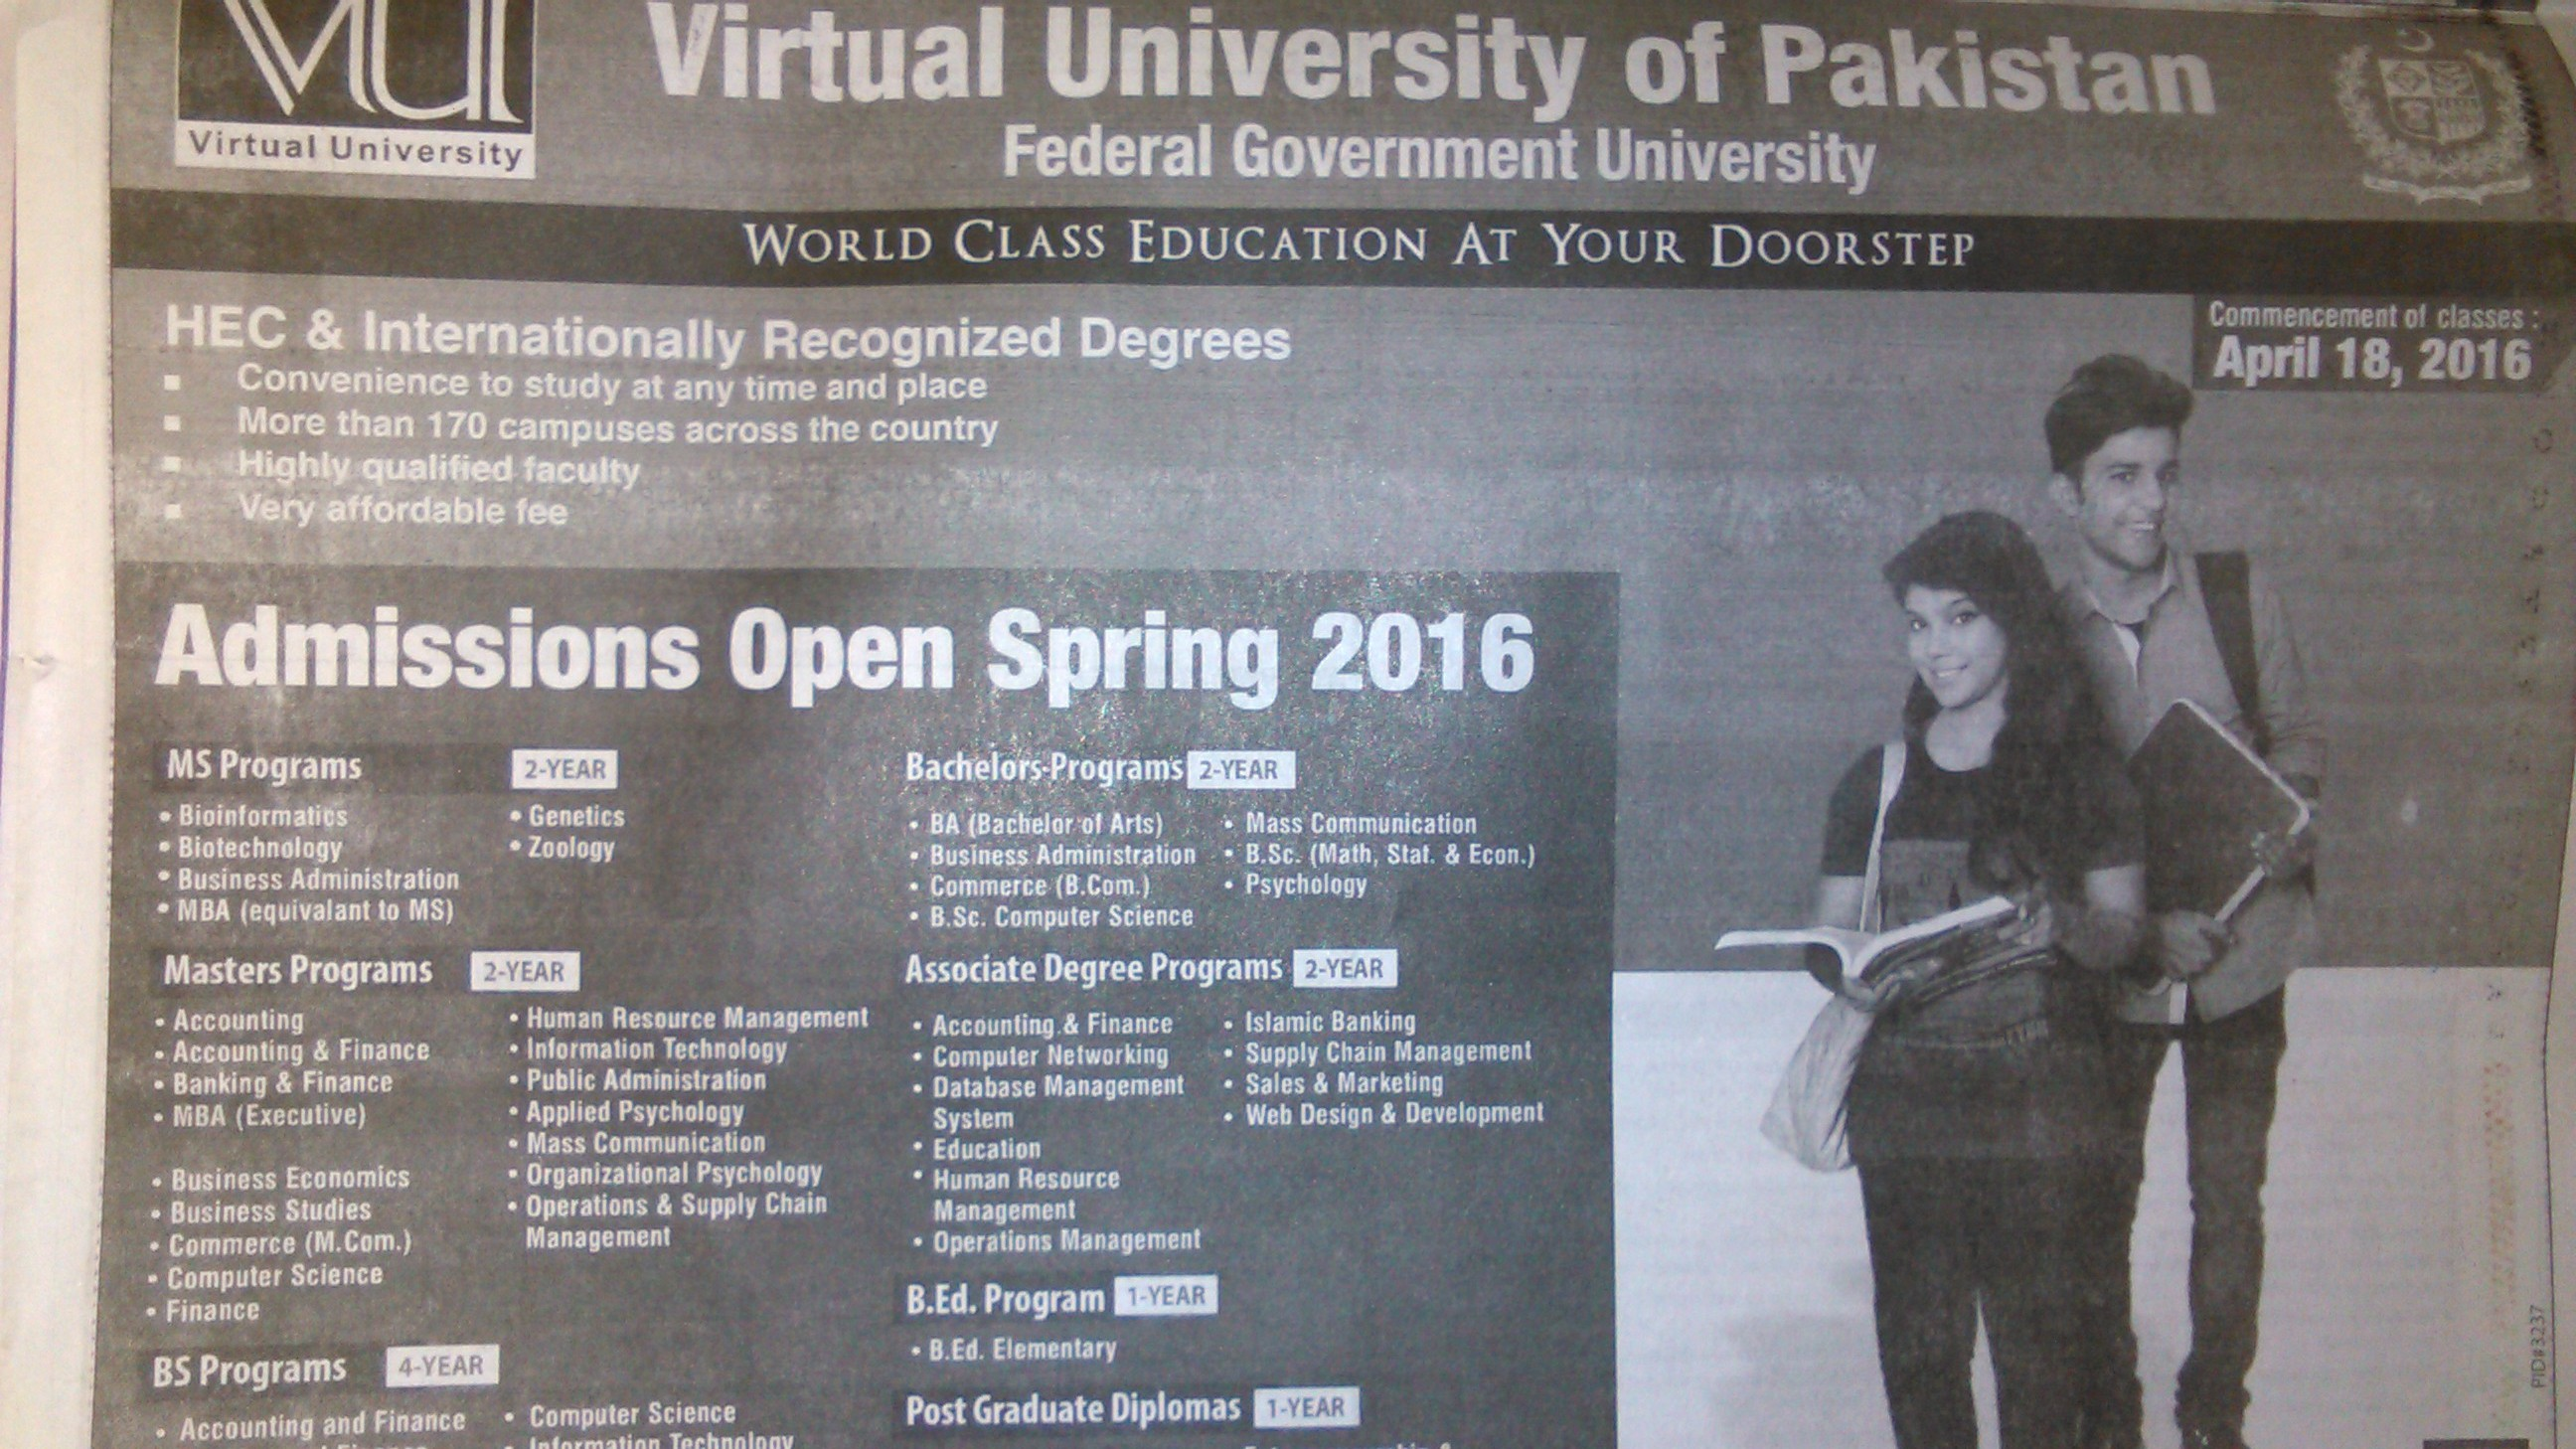 Virtual University of Pakistan Admission Spring 2016